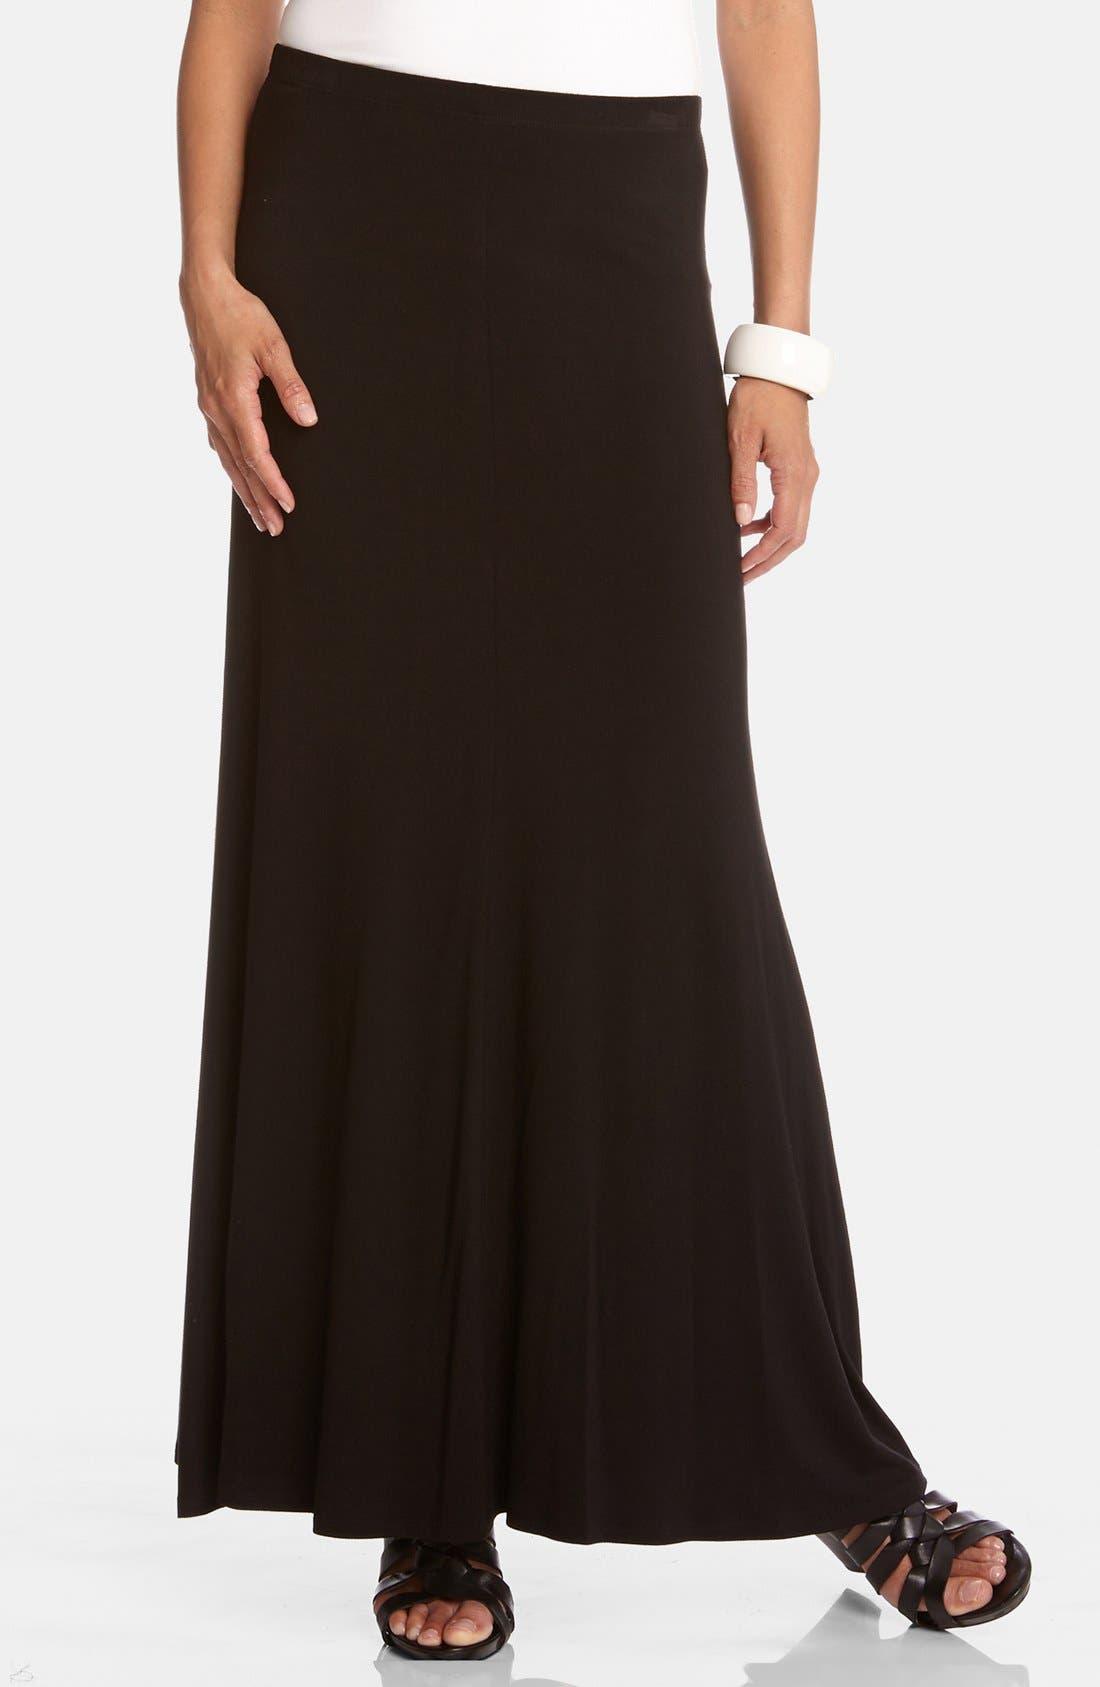 KAREN KANE, Flared Maxi Skirt, Main thumbnail 1, color, BLACK